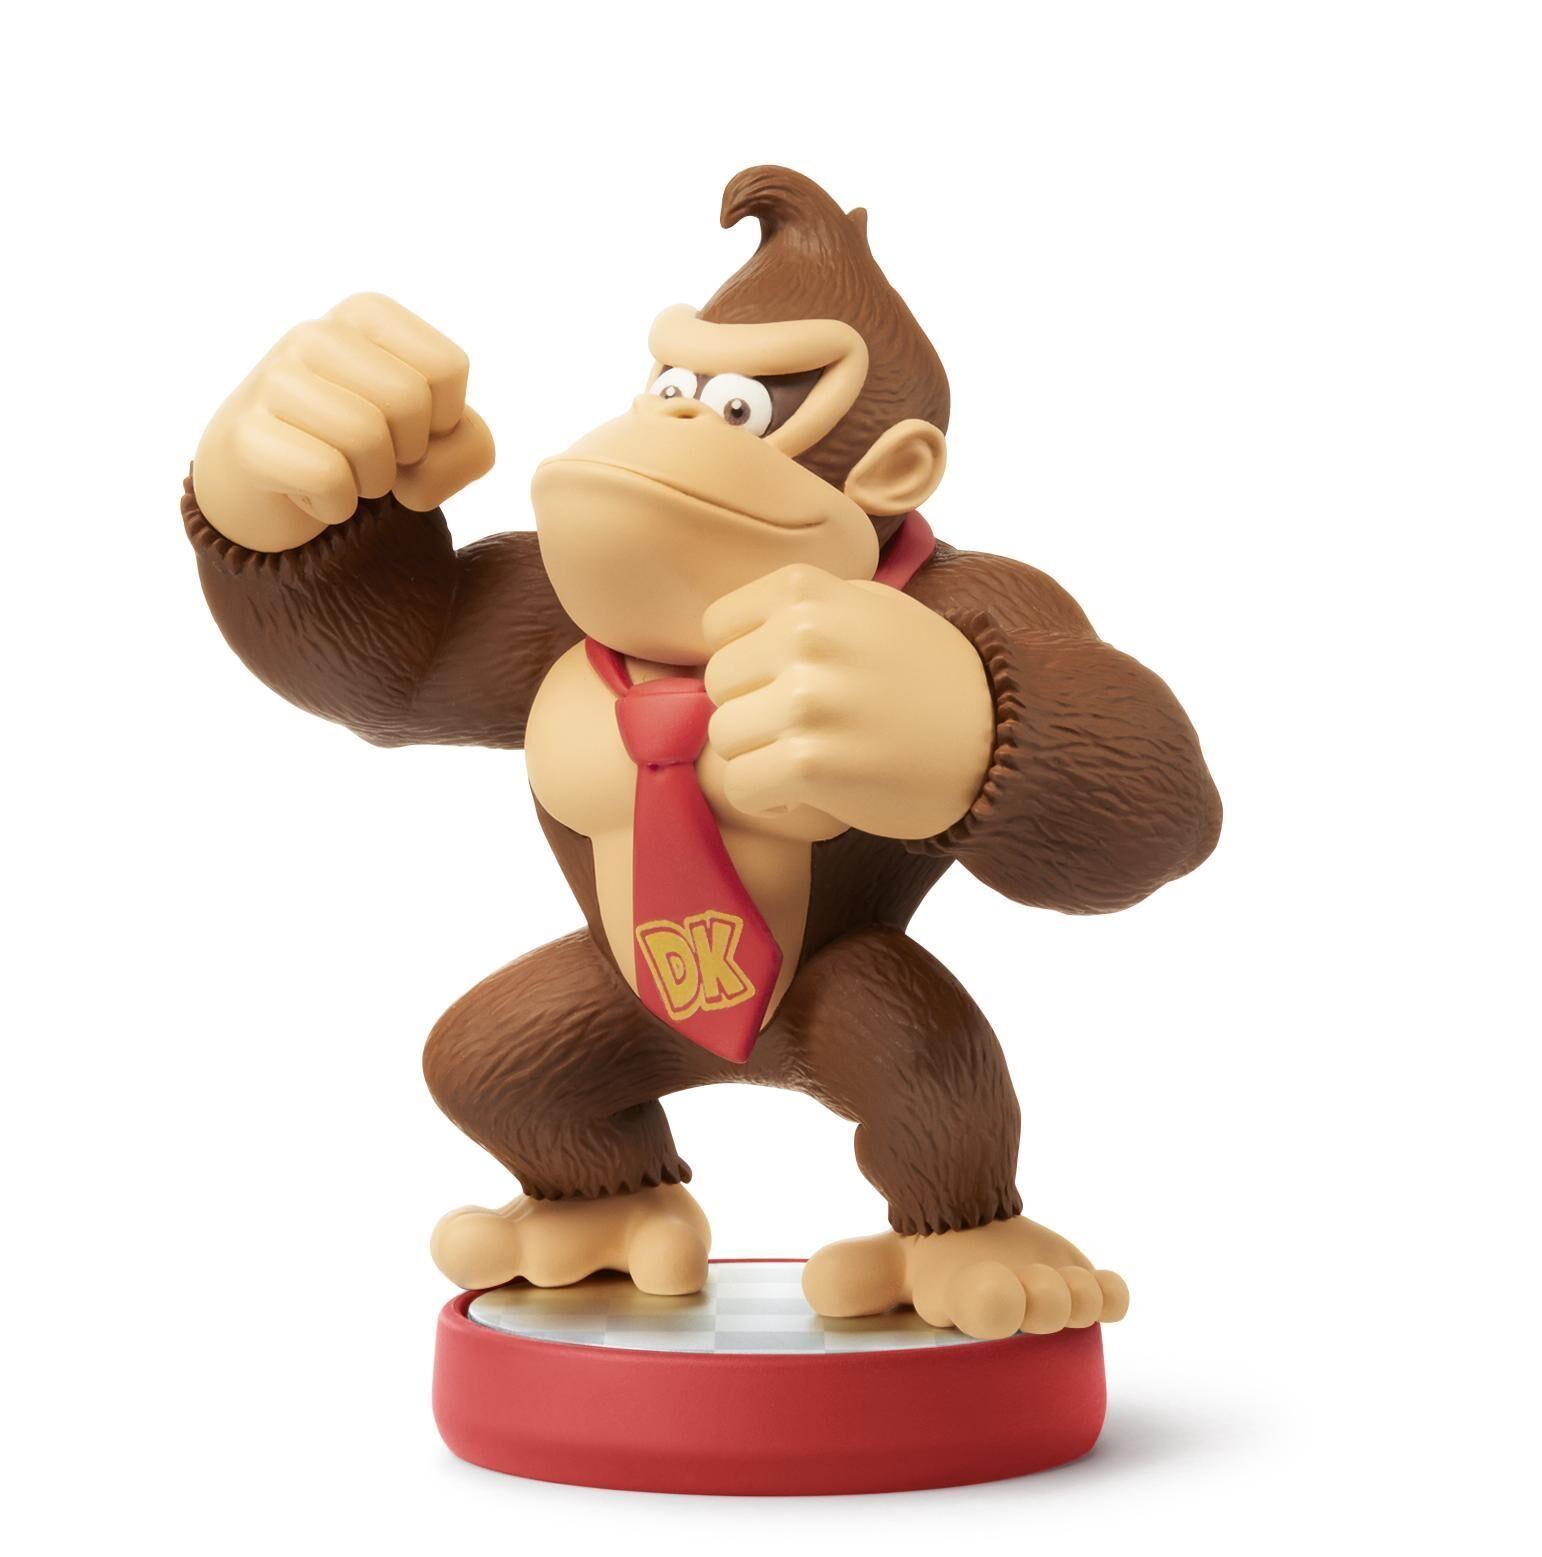 NINTENDO Figurine Amiibo - Super Mario - Donkey Kong